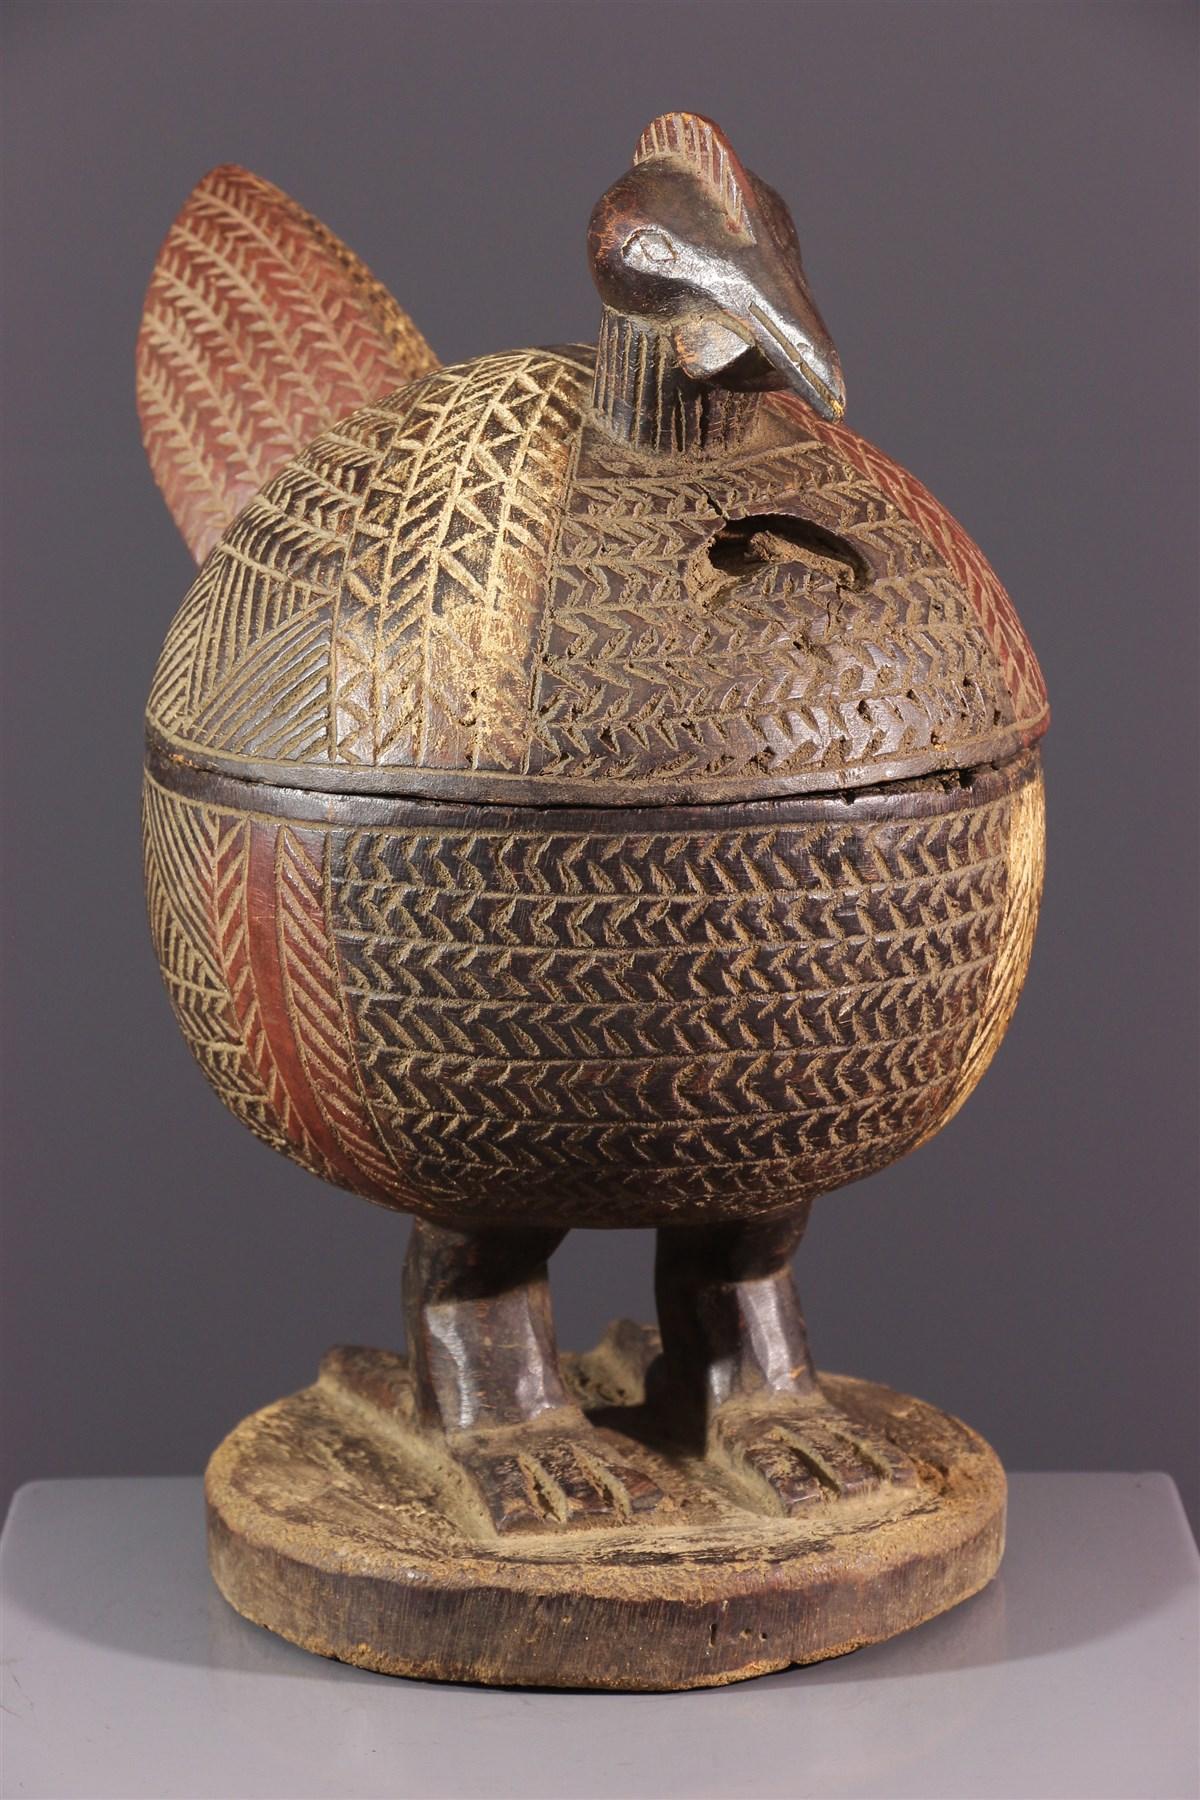 Coupe à offrandes zoomorphe Yoruba - Art africain